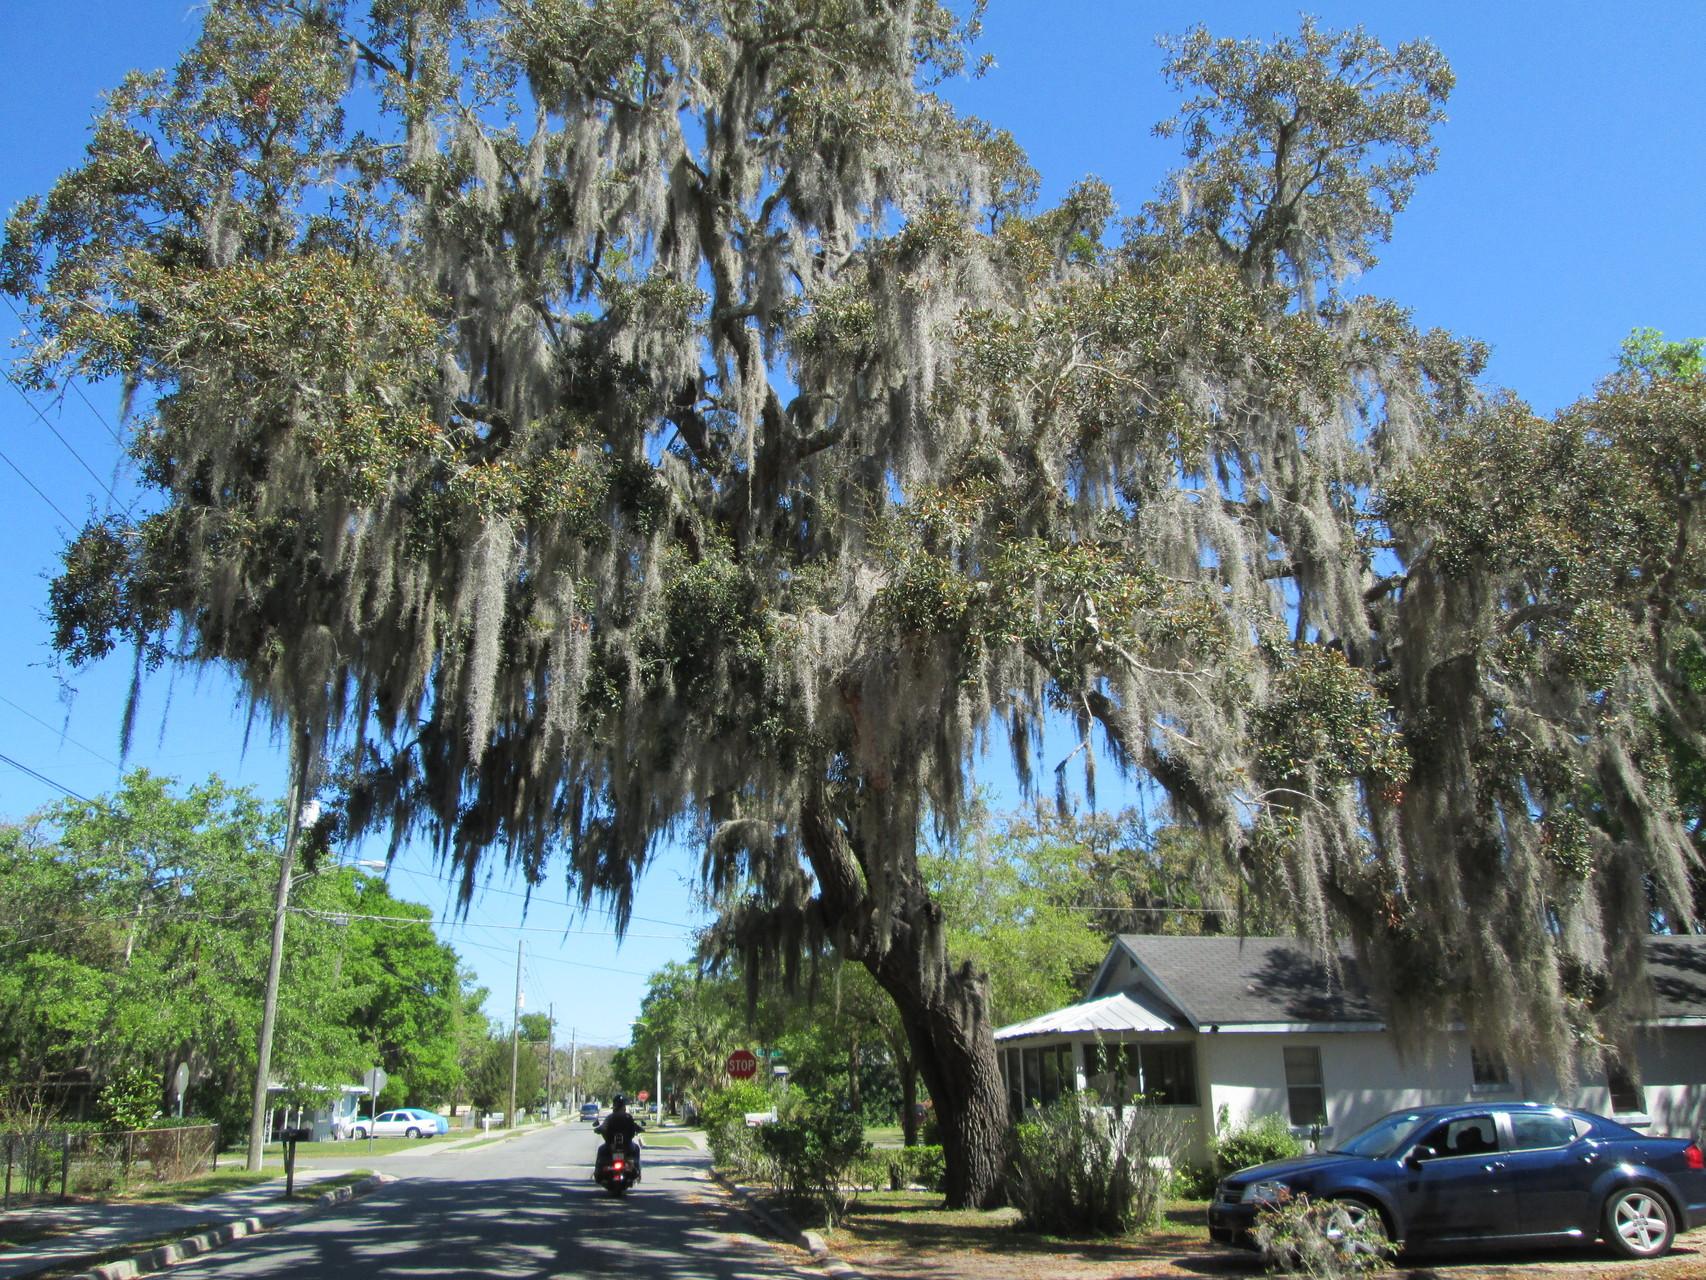 Die Geisterbäume in Florida